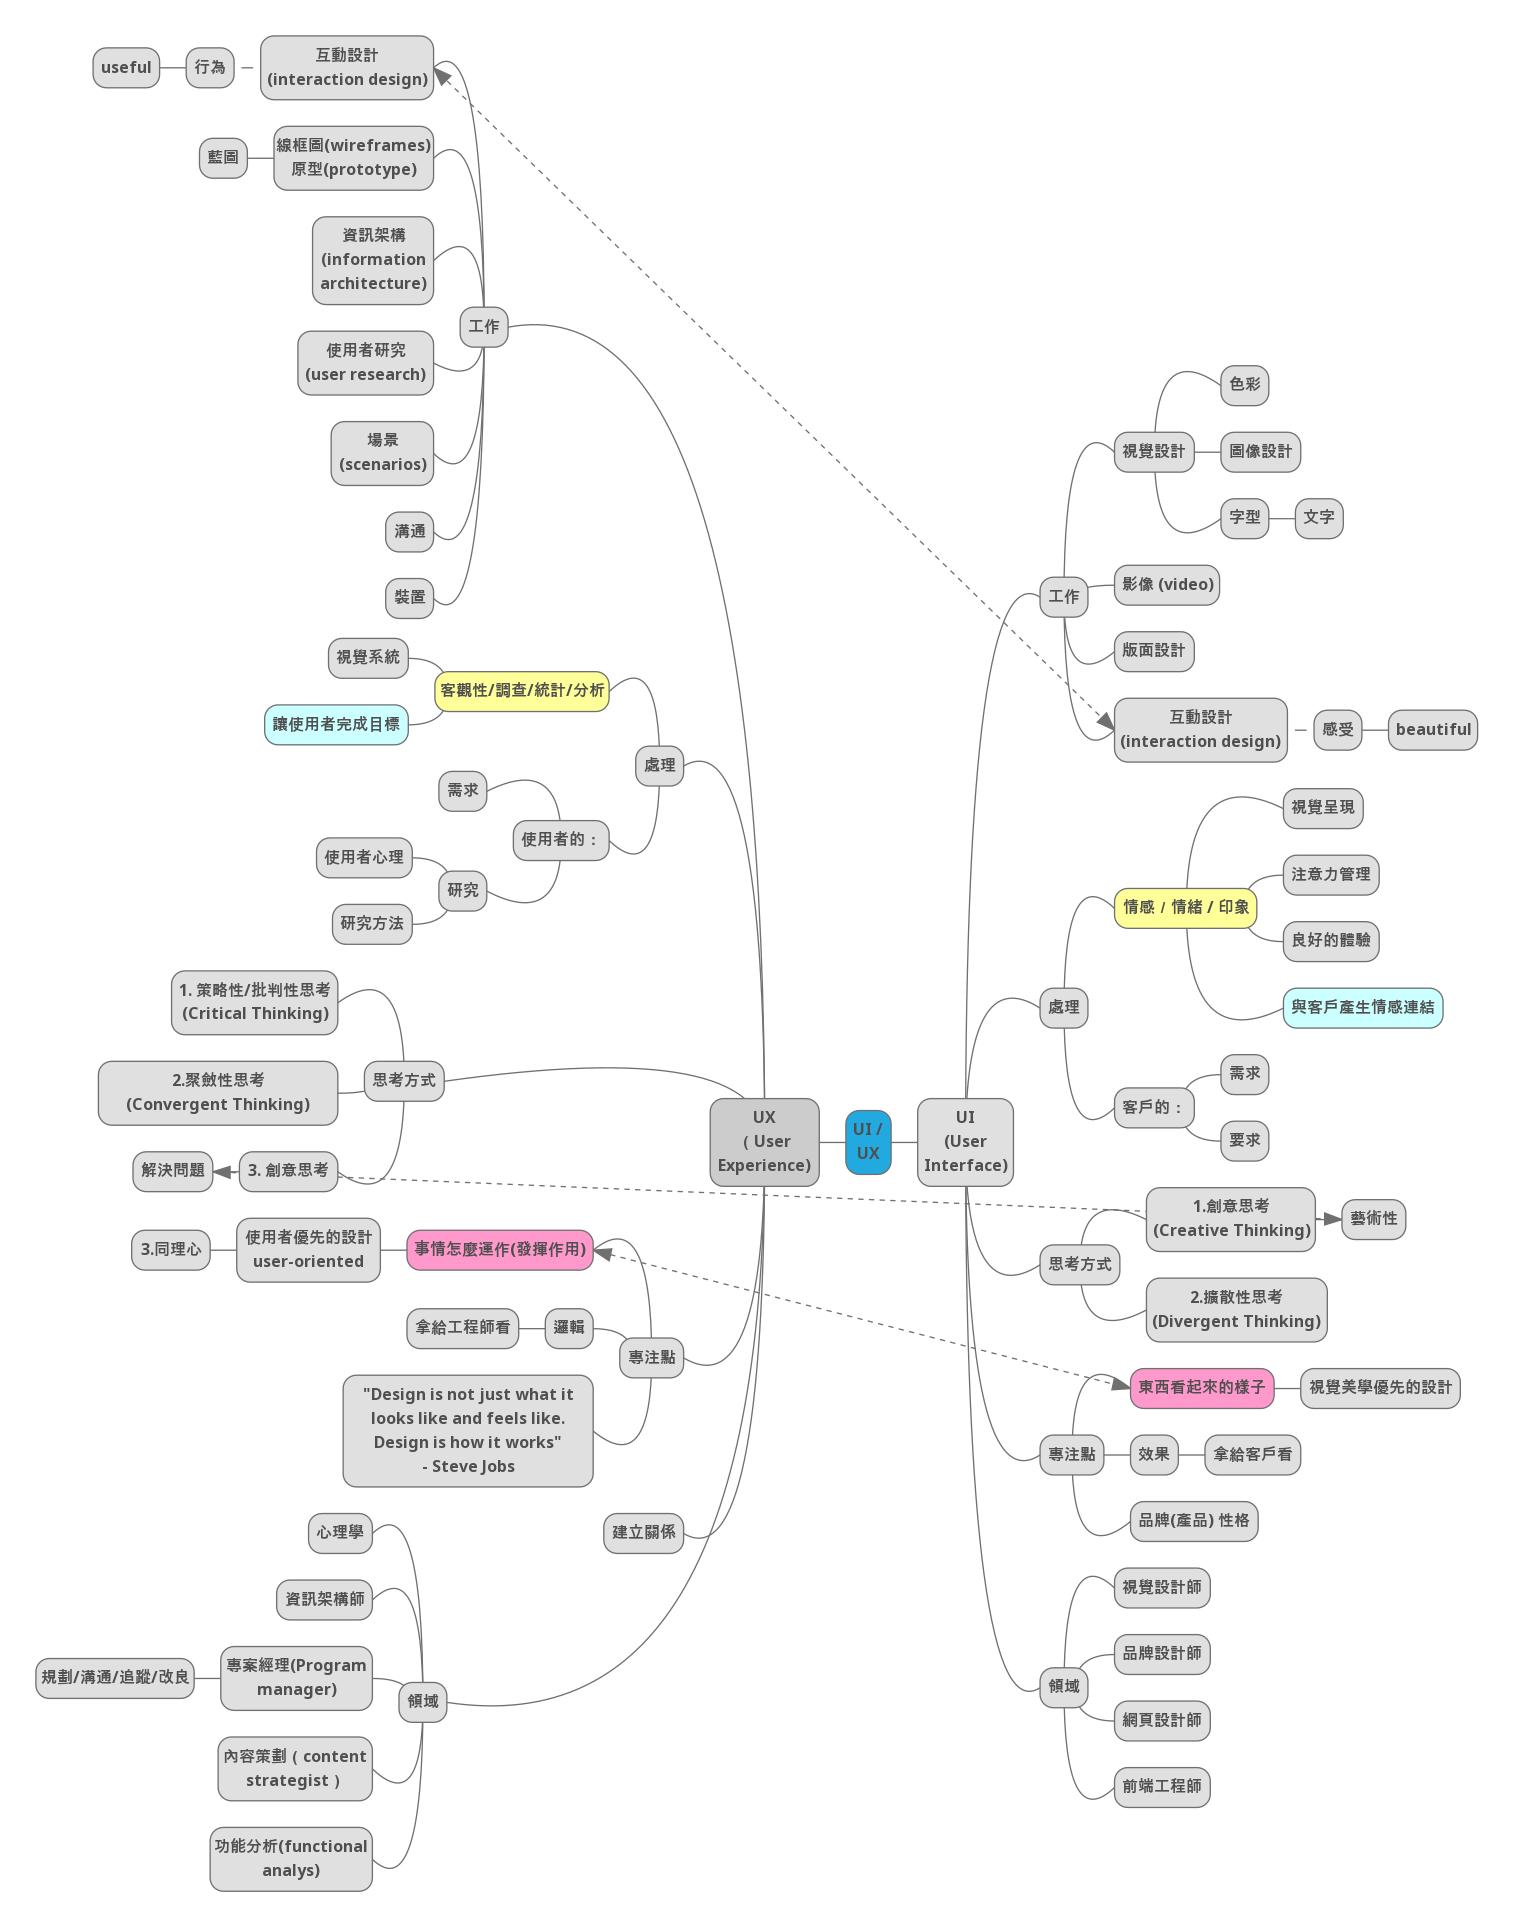 UI 和 UX 設計的不同 用心智圖 (mindmap) 呈現